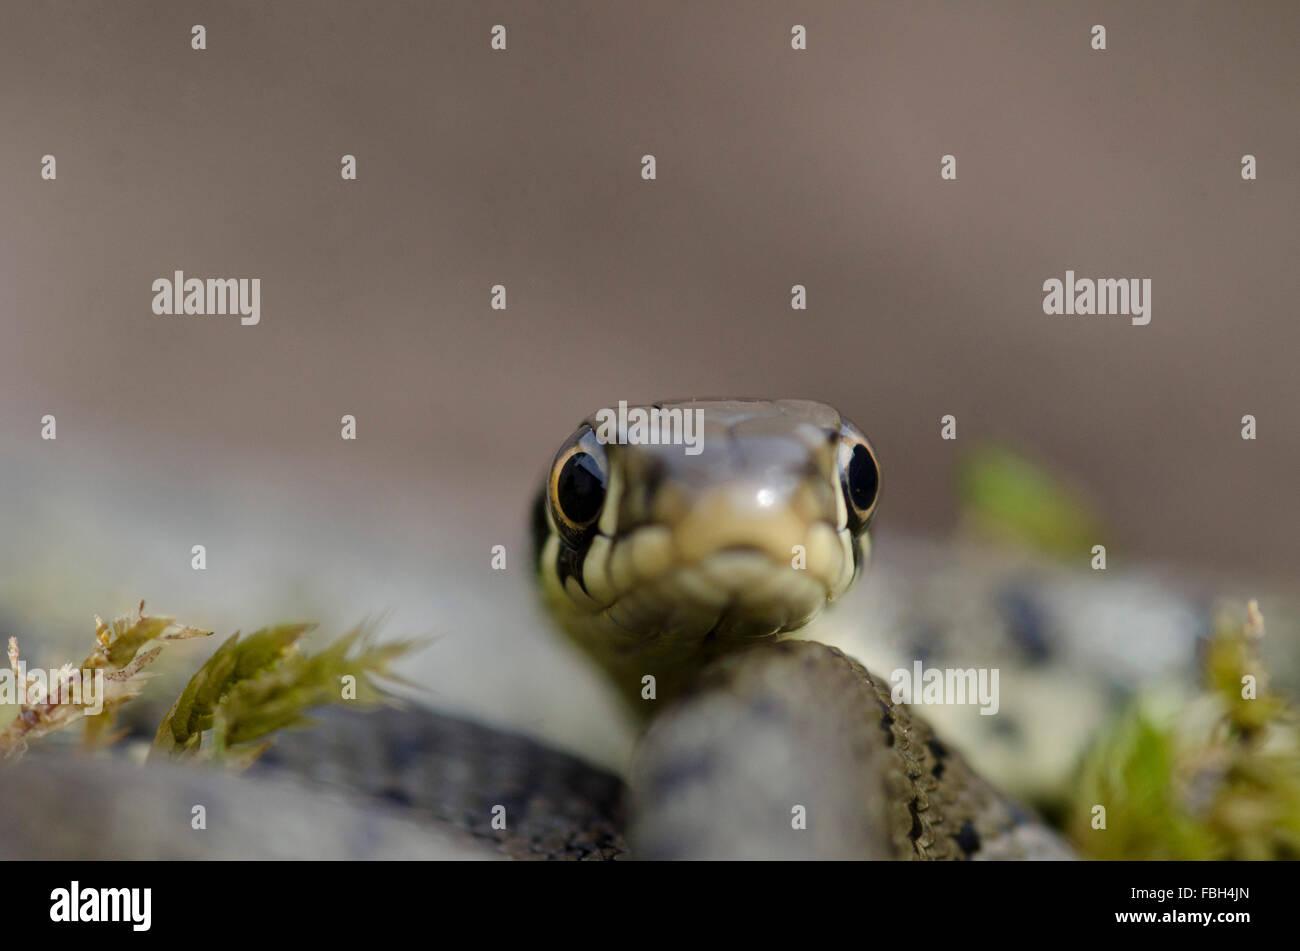 Grass Snake hatchling - Stock Image